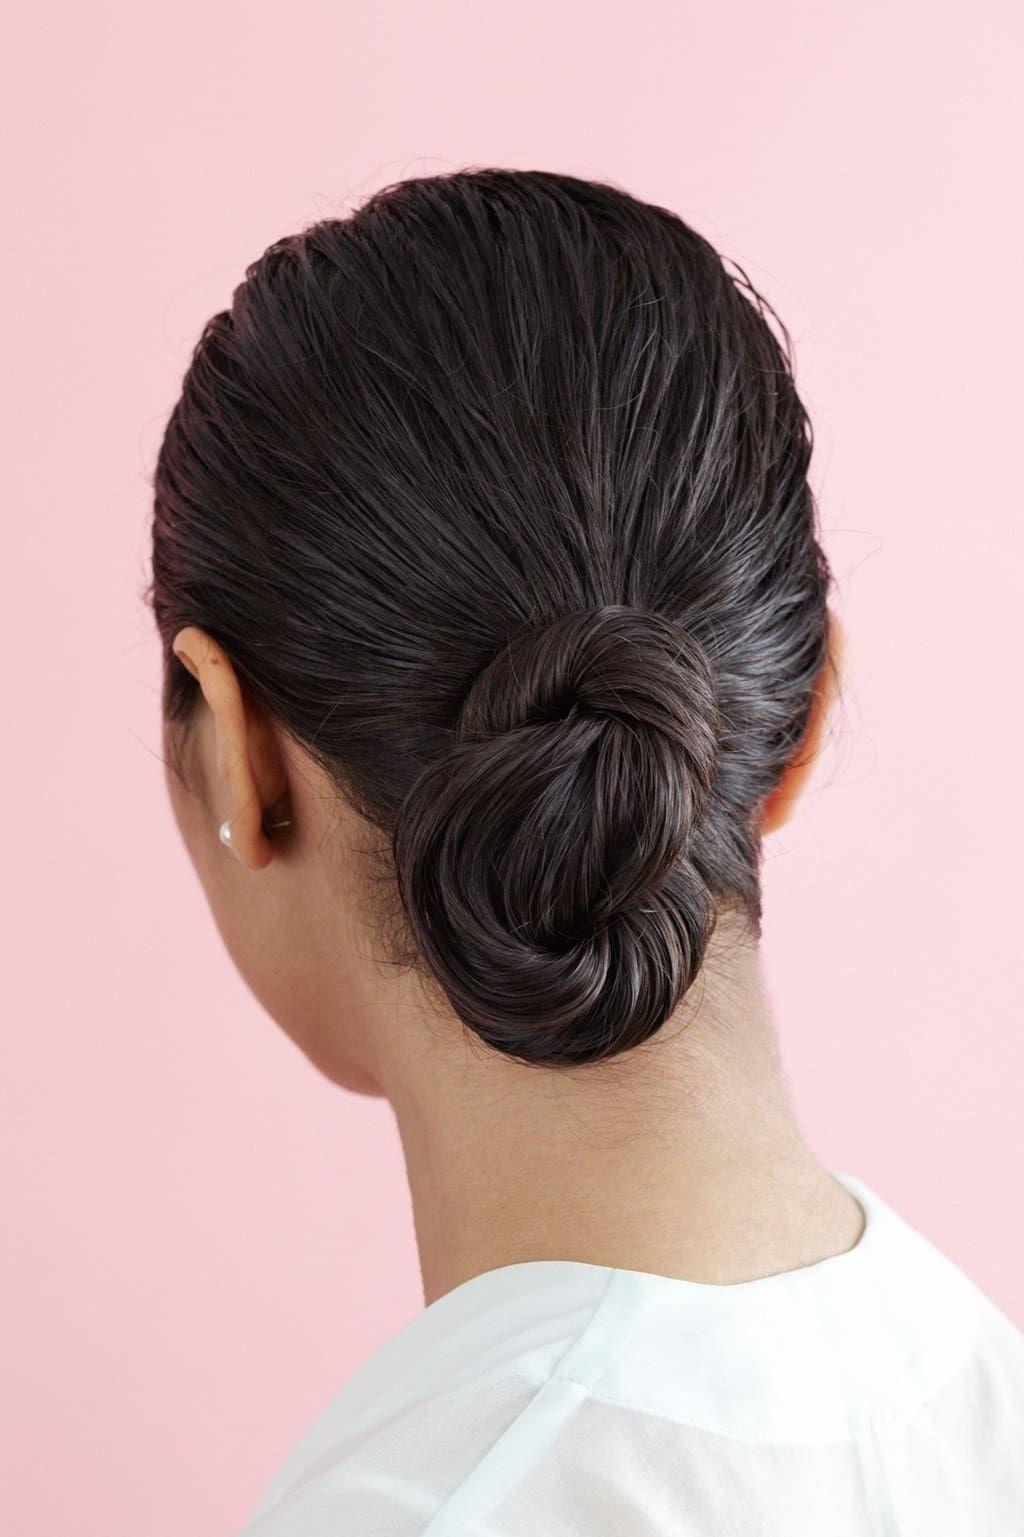 30 stunning noheat hairstyles to help you through summer